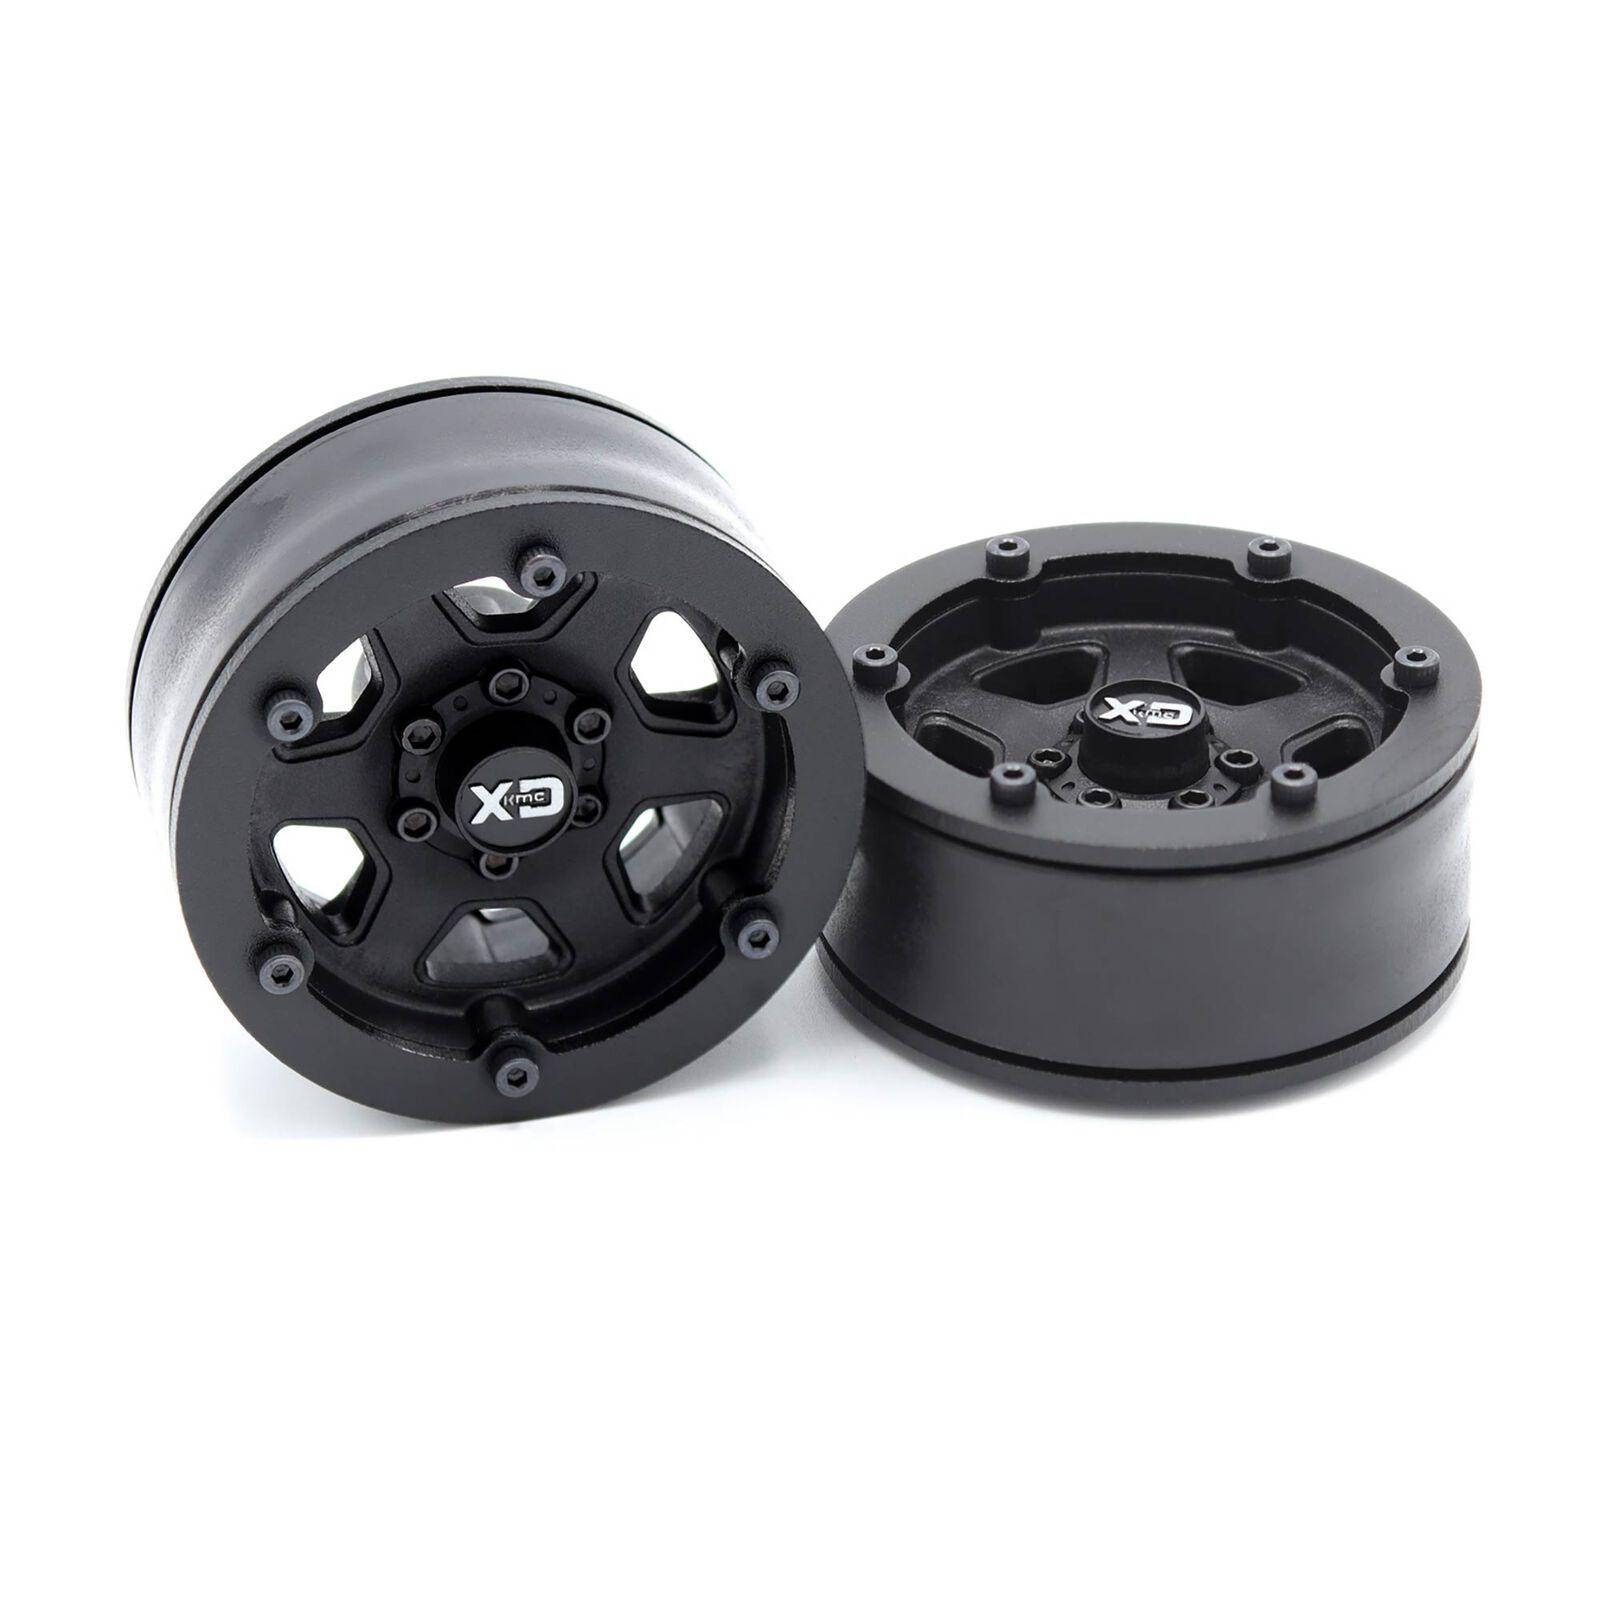 "Incision 1.9"" KMC KM233 Hex Plastic Wheels, Black"